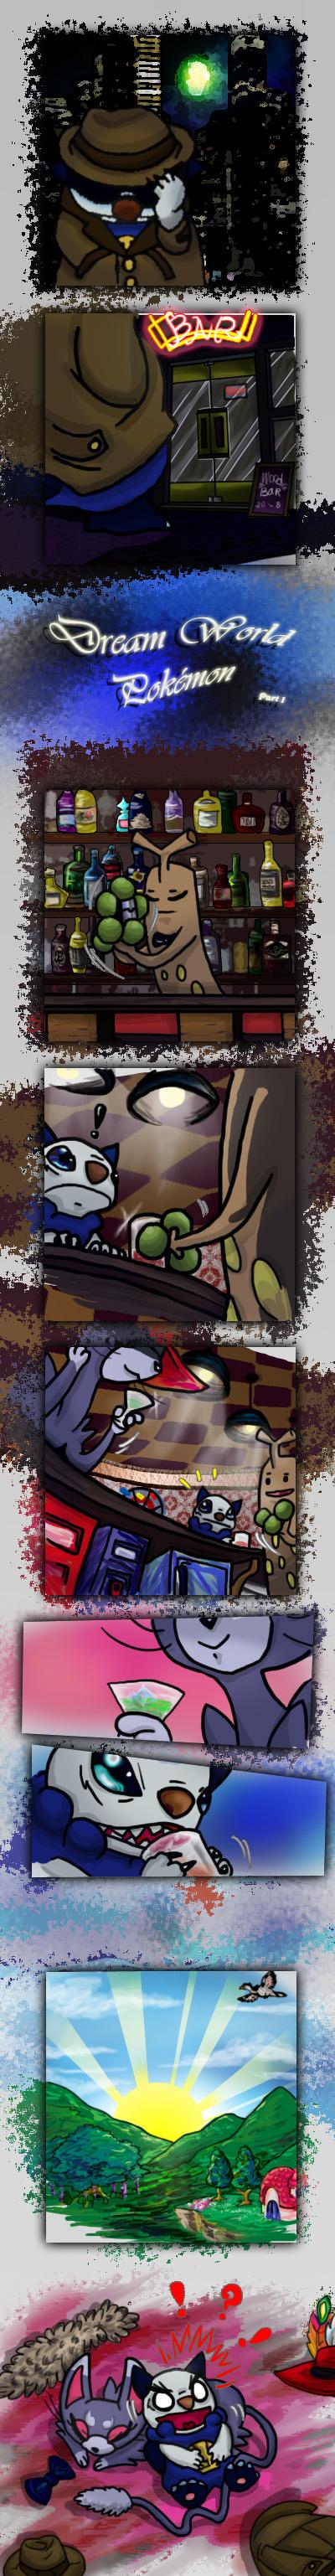 pokemon creepypasta audinos revenge